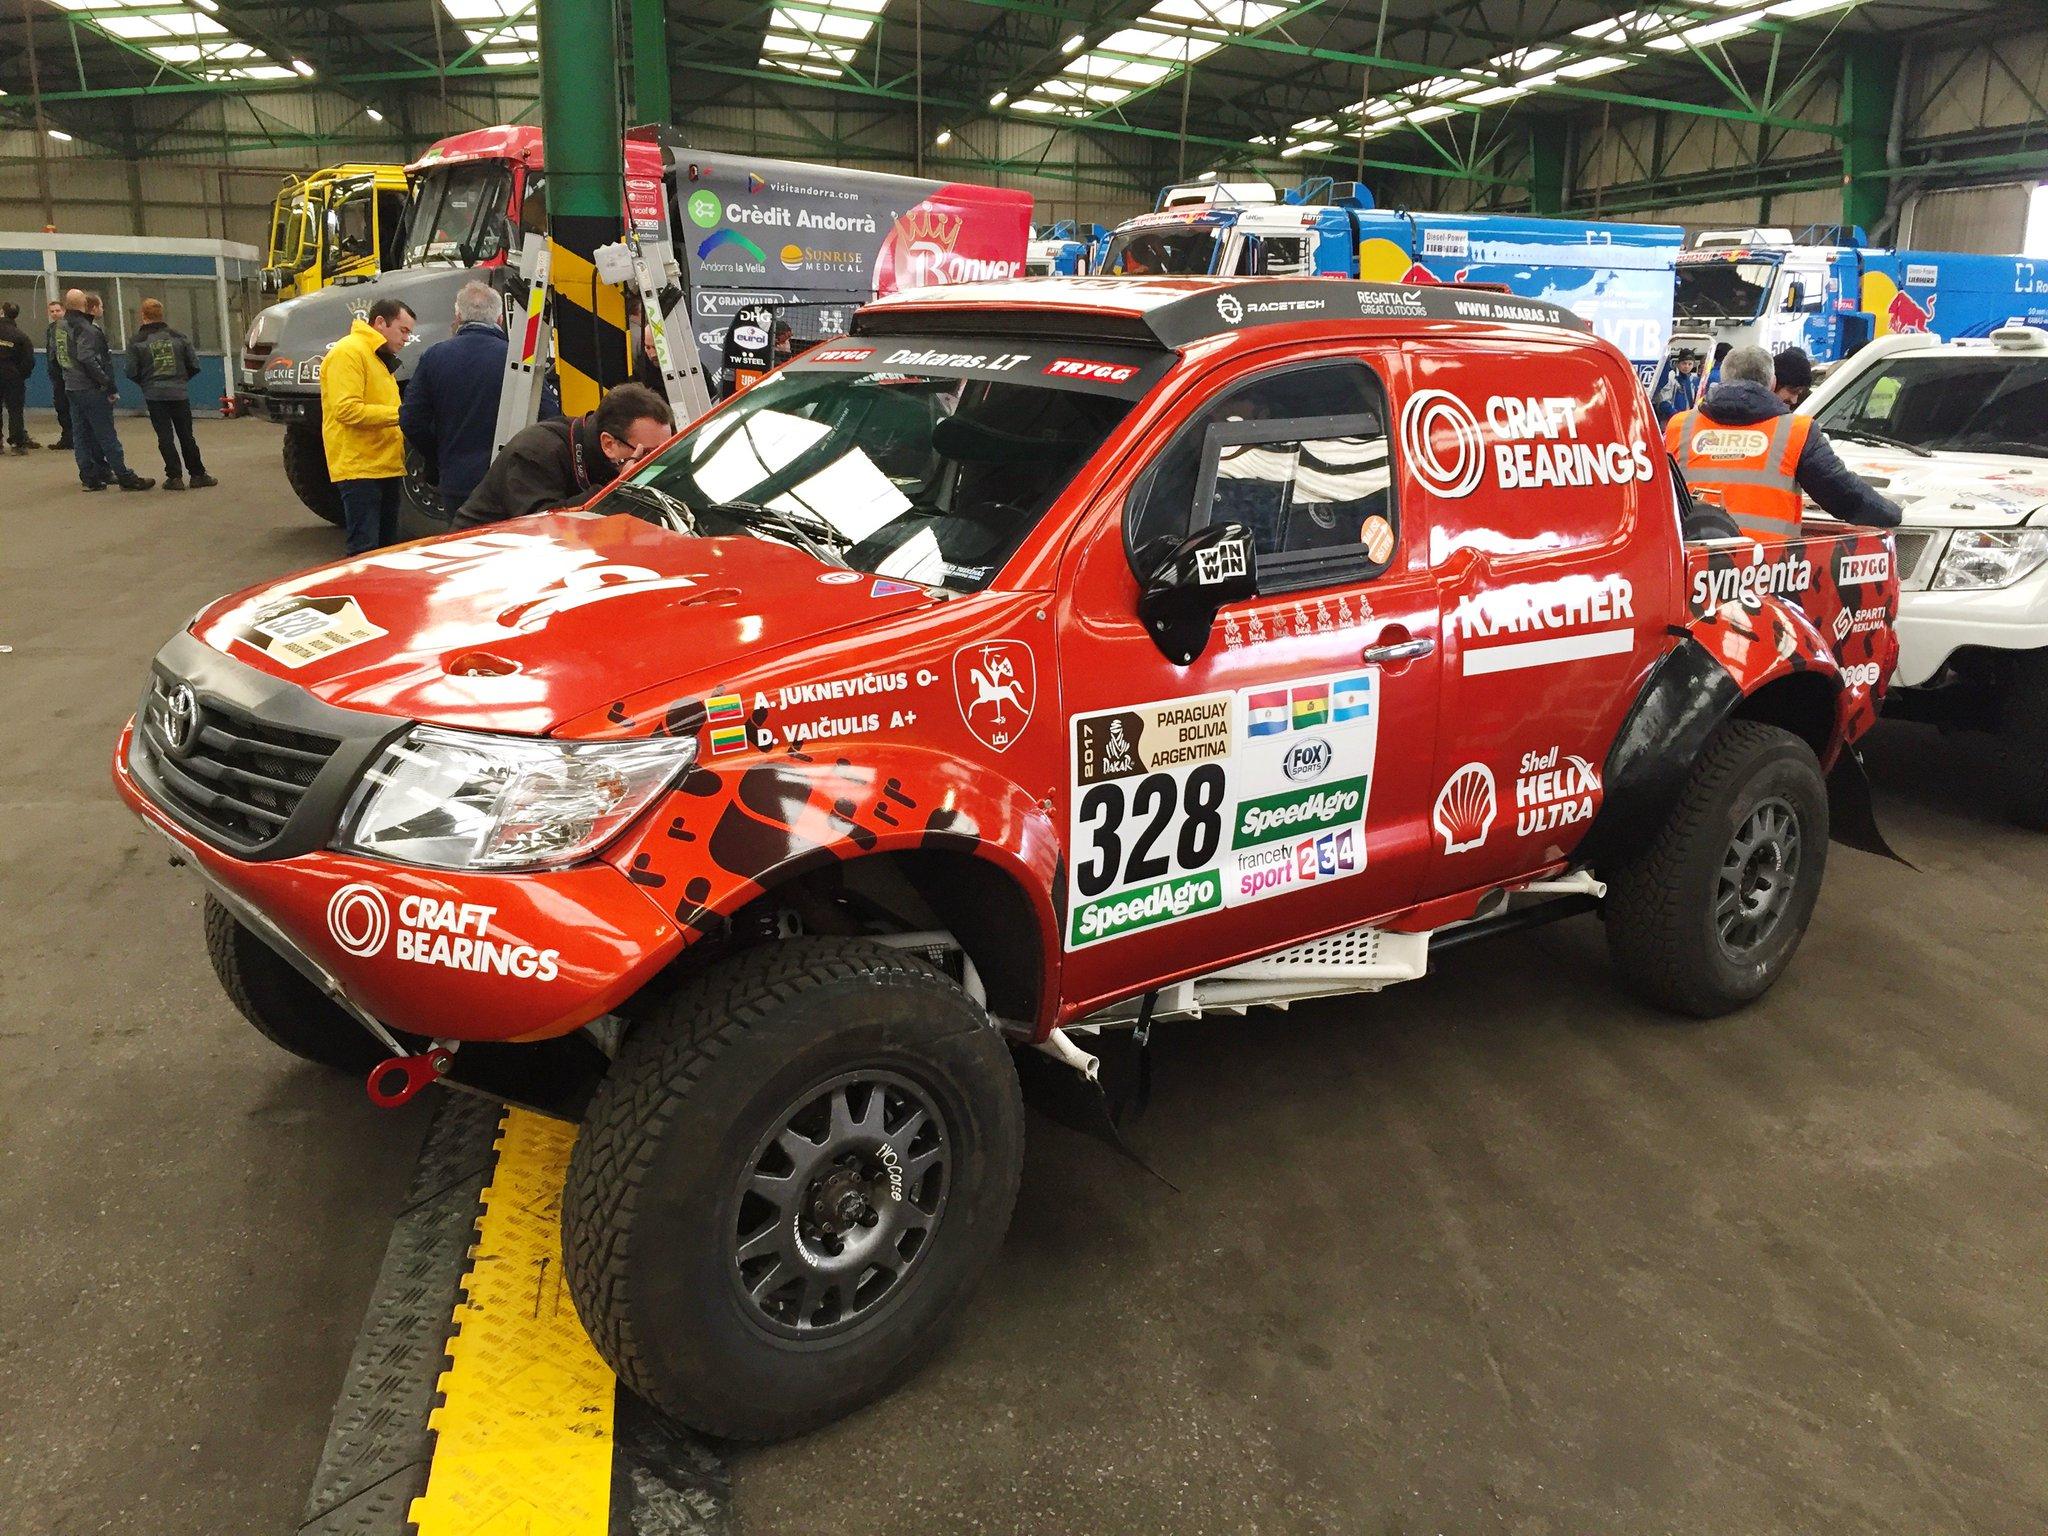 2017 Rallye Raid Dakar Paraguay - Bolivia - Argentina [2-14 Enero] - Página 5 CyBnAeJXgAA3JTC